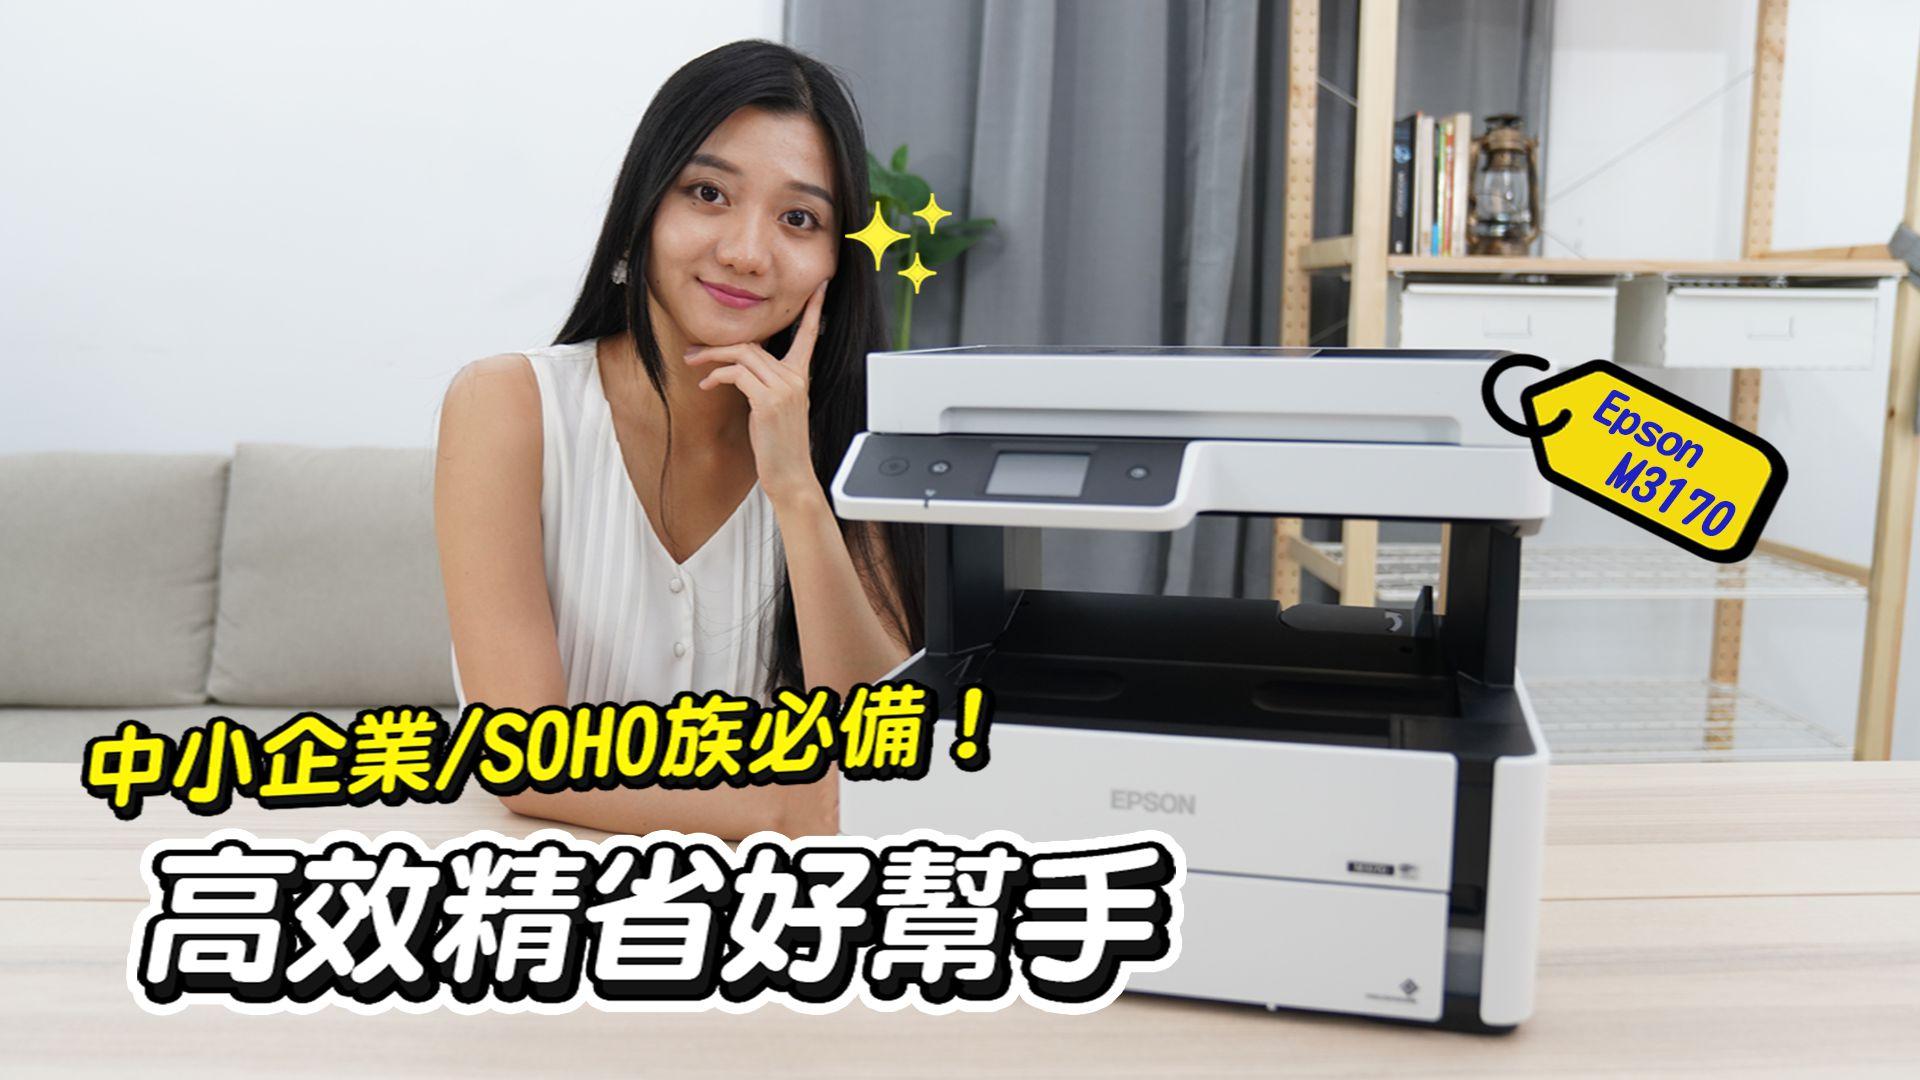 Epson M3170 黑白連續供墨印表機開箱|中小企業/SOHO族必備! 效率精省好幫手